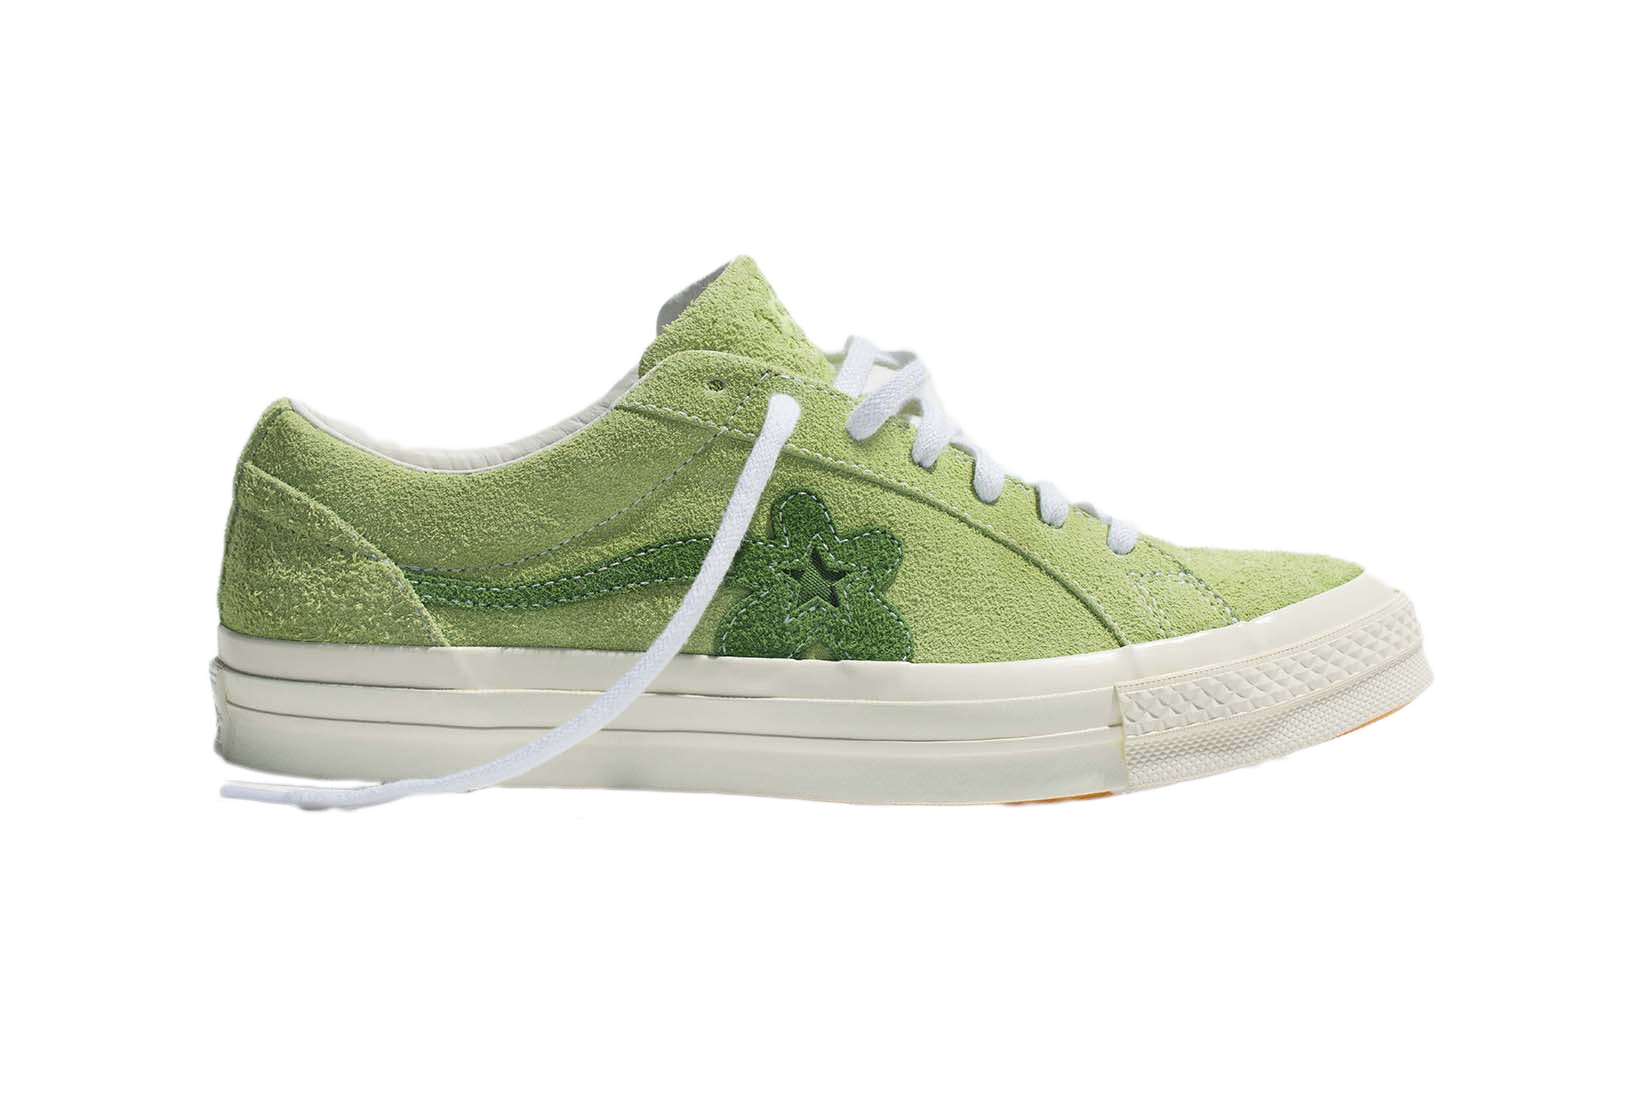 Converse One Star Ox Tyler The Creator Golf Le Fleur Jade Lime